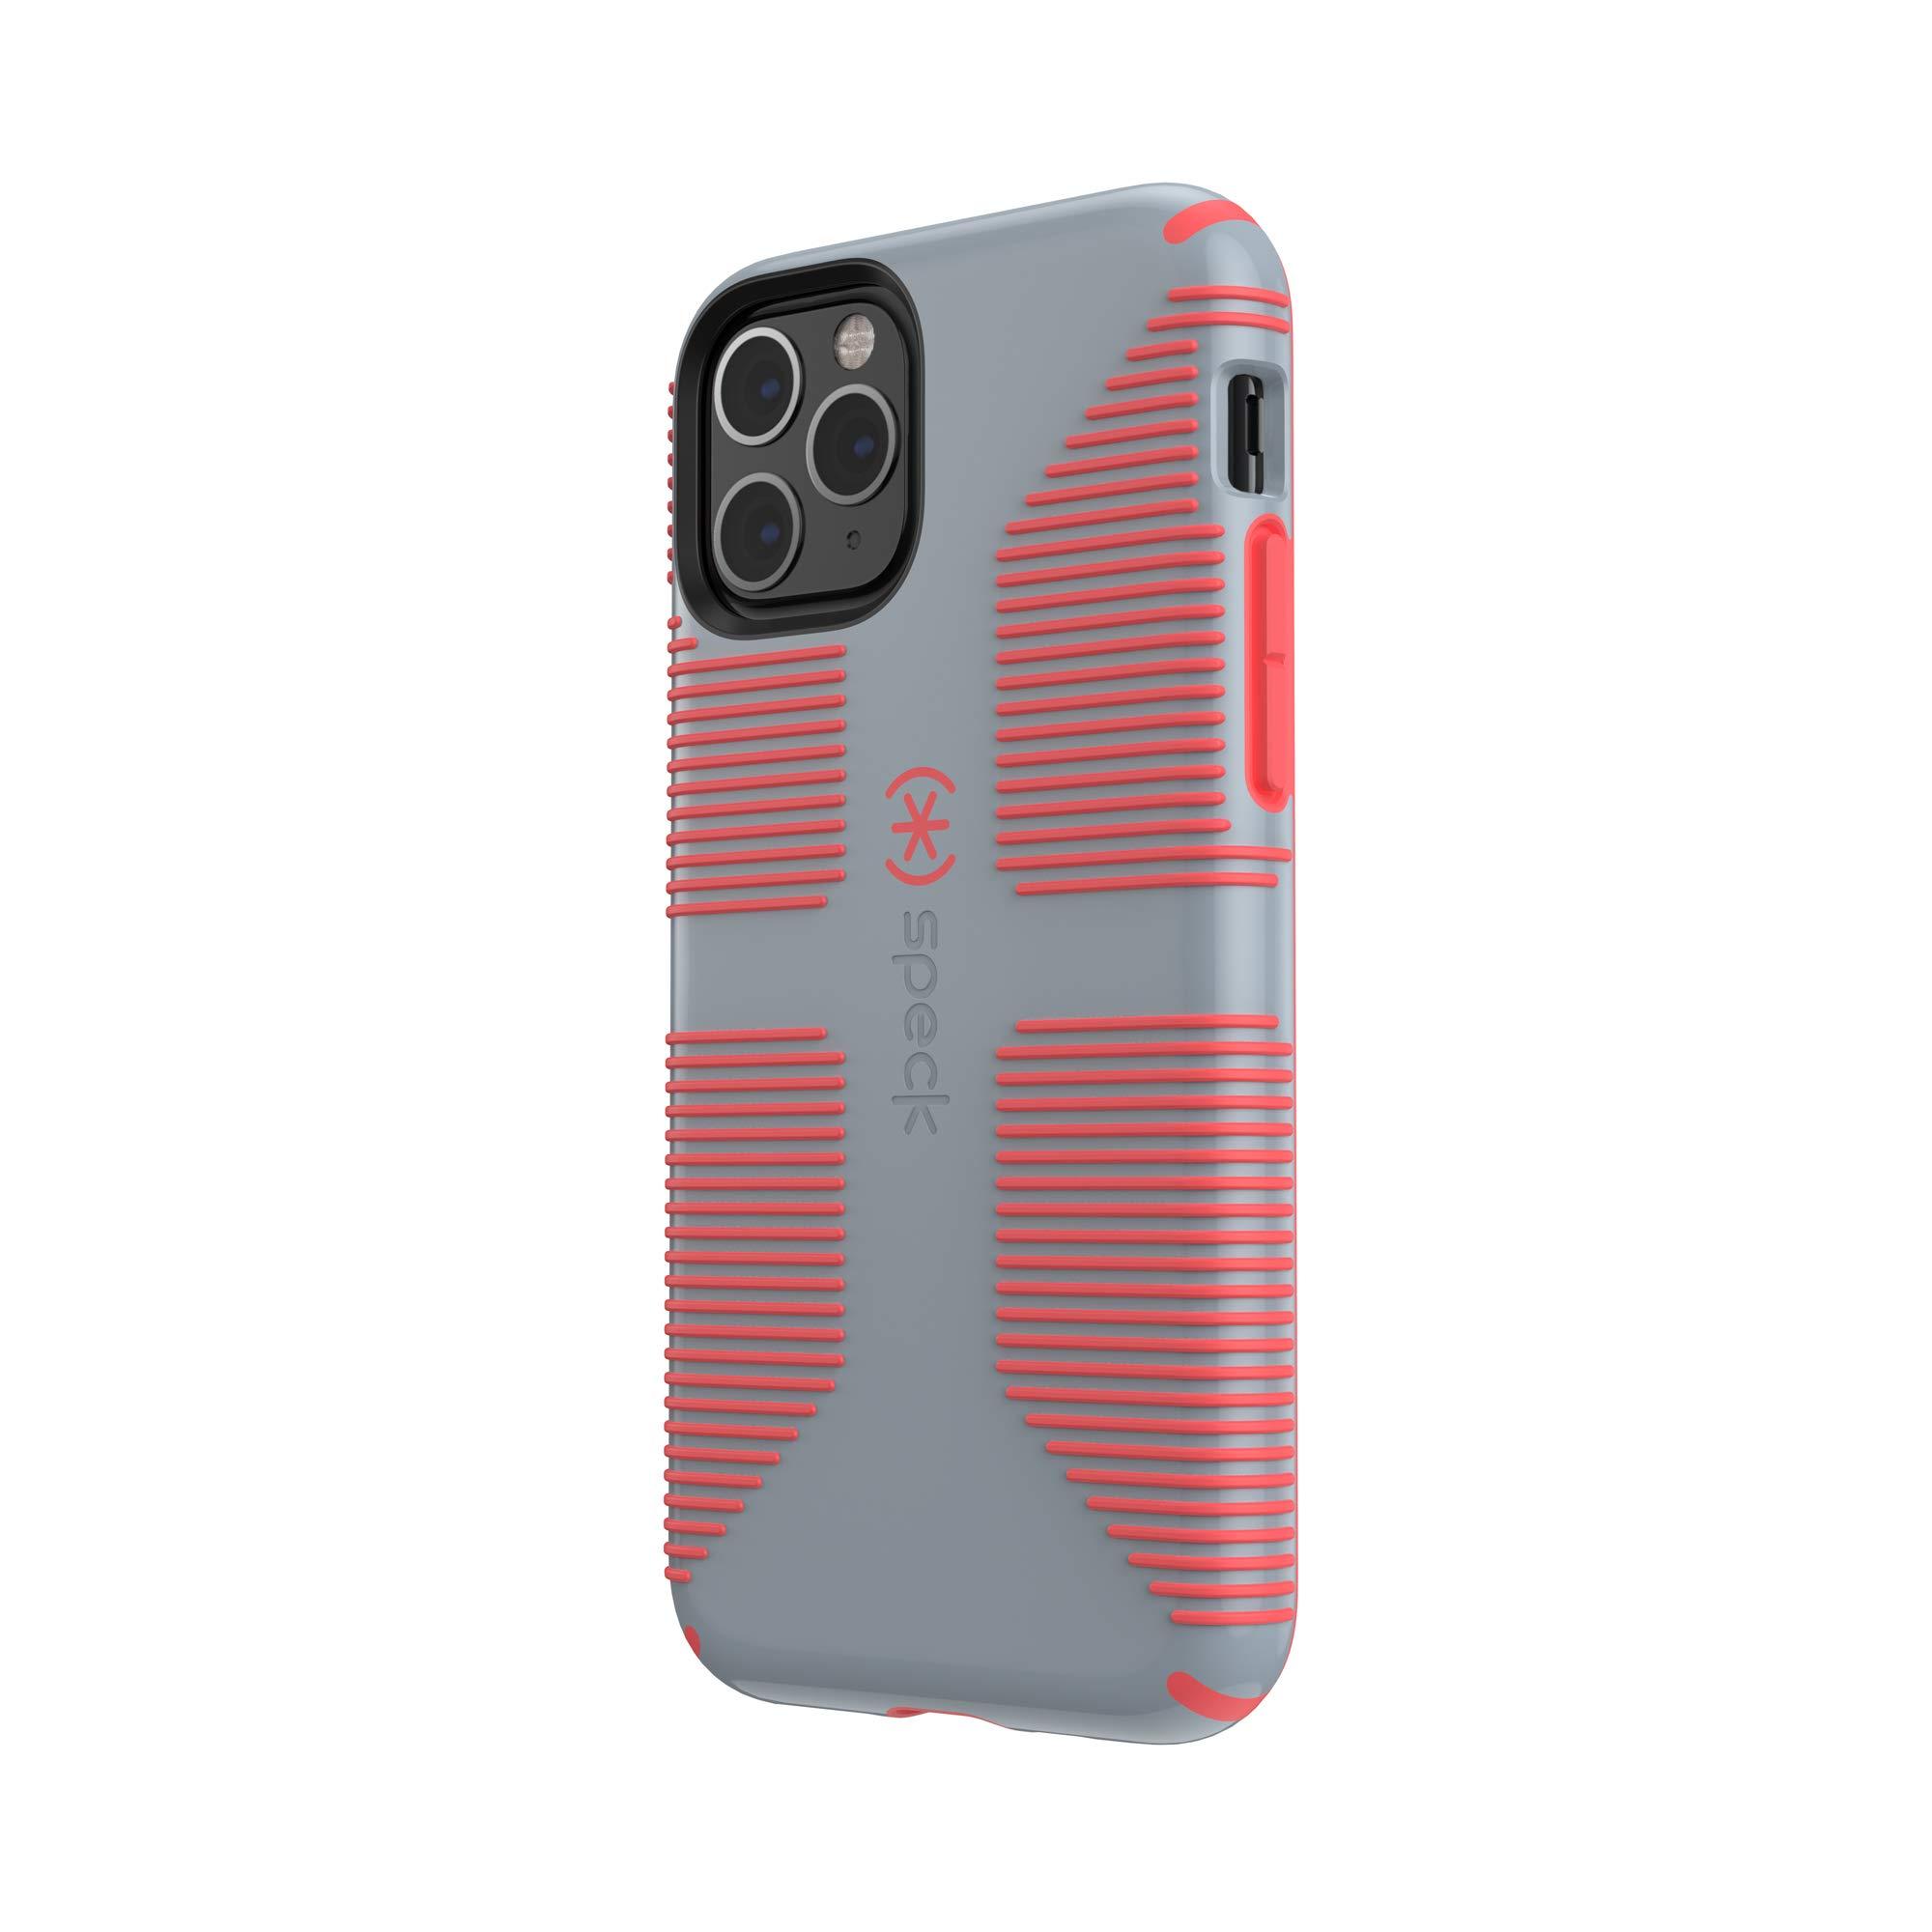 Speck CandyShell Grip iPhone 11 Pro Case, Nickel Grey/Warning Orange